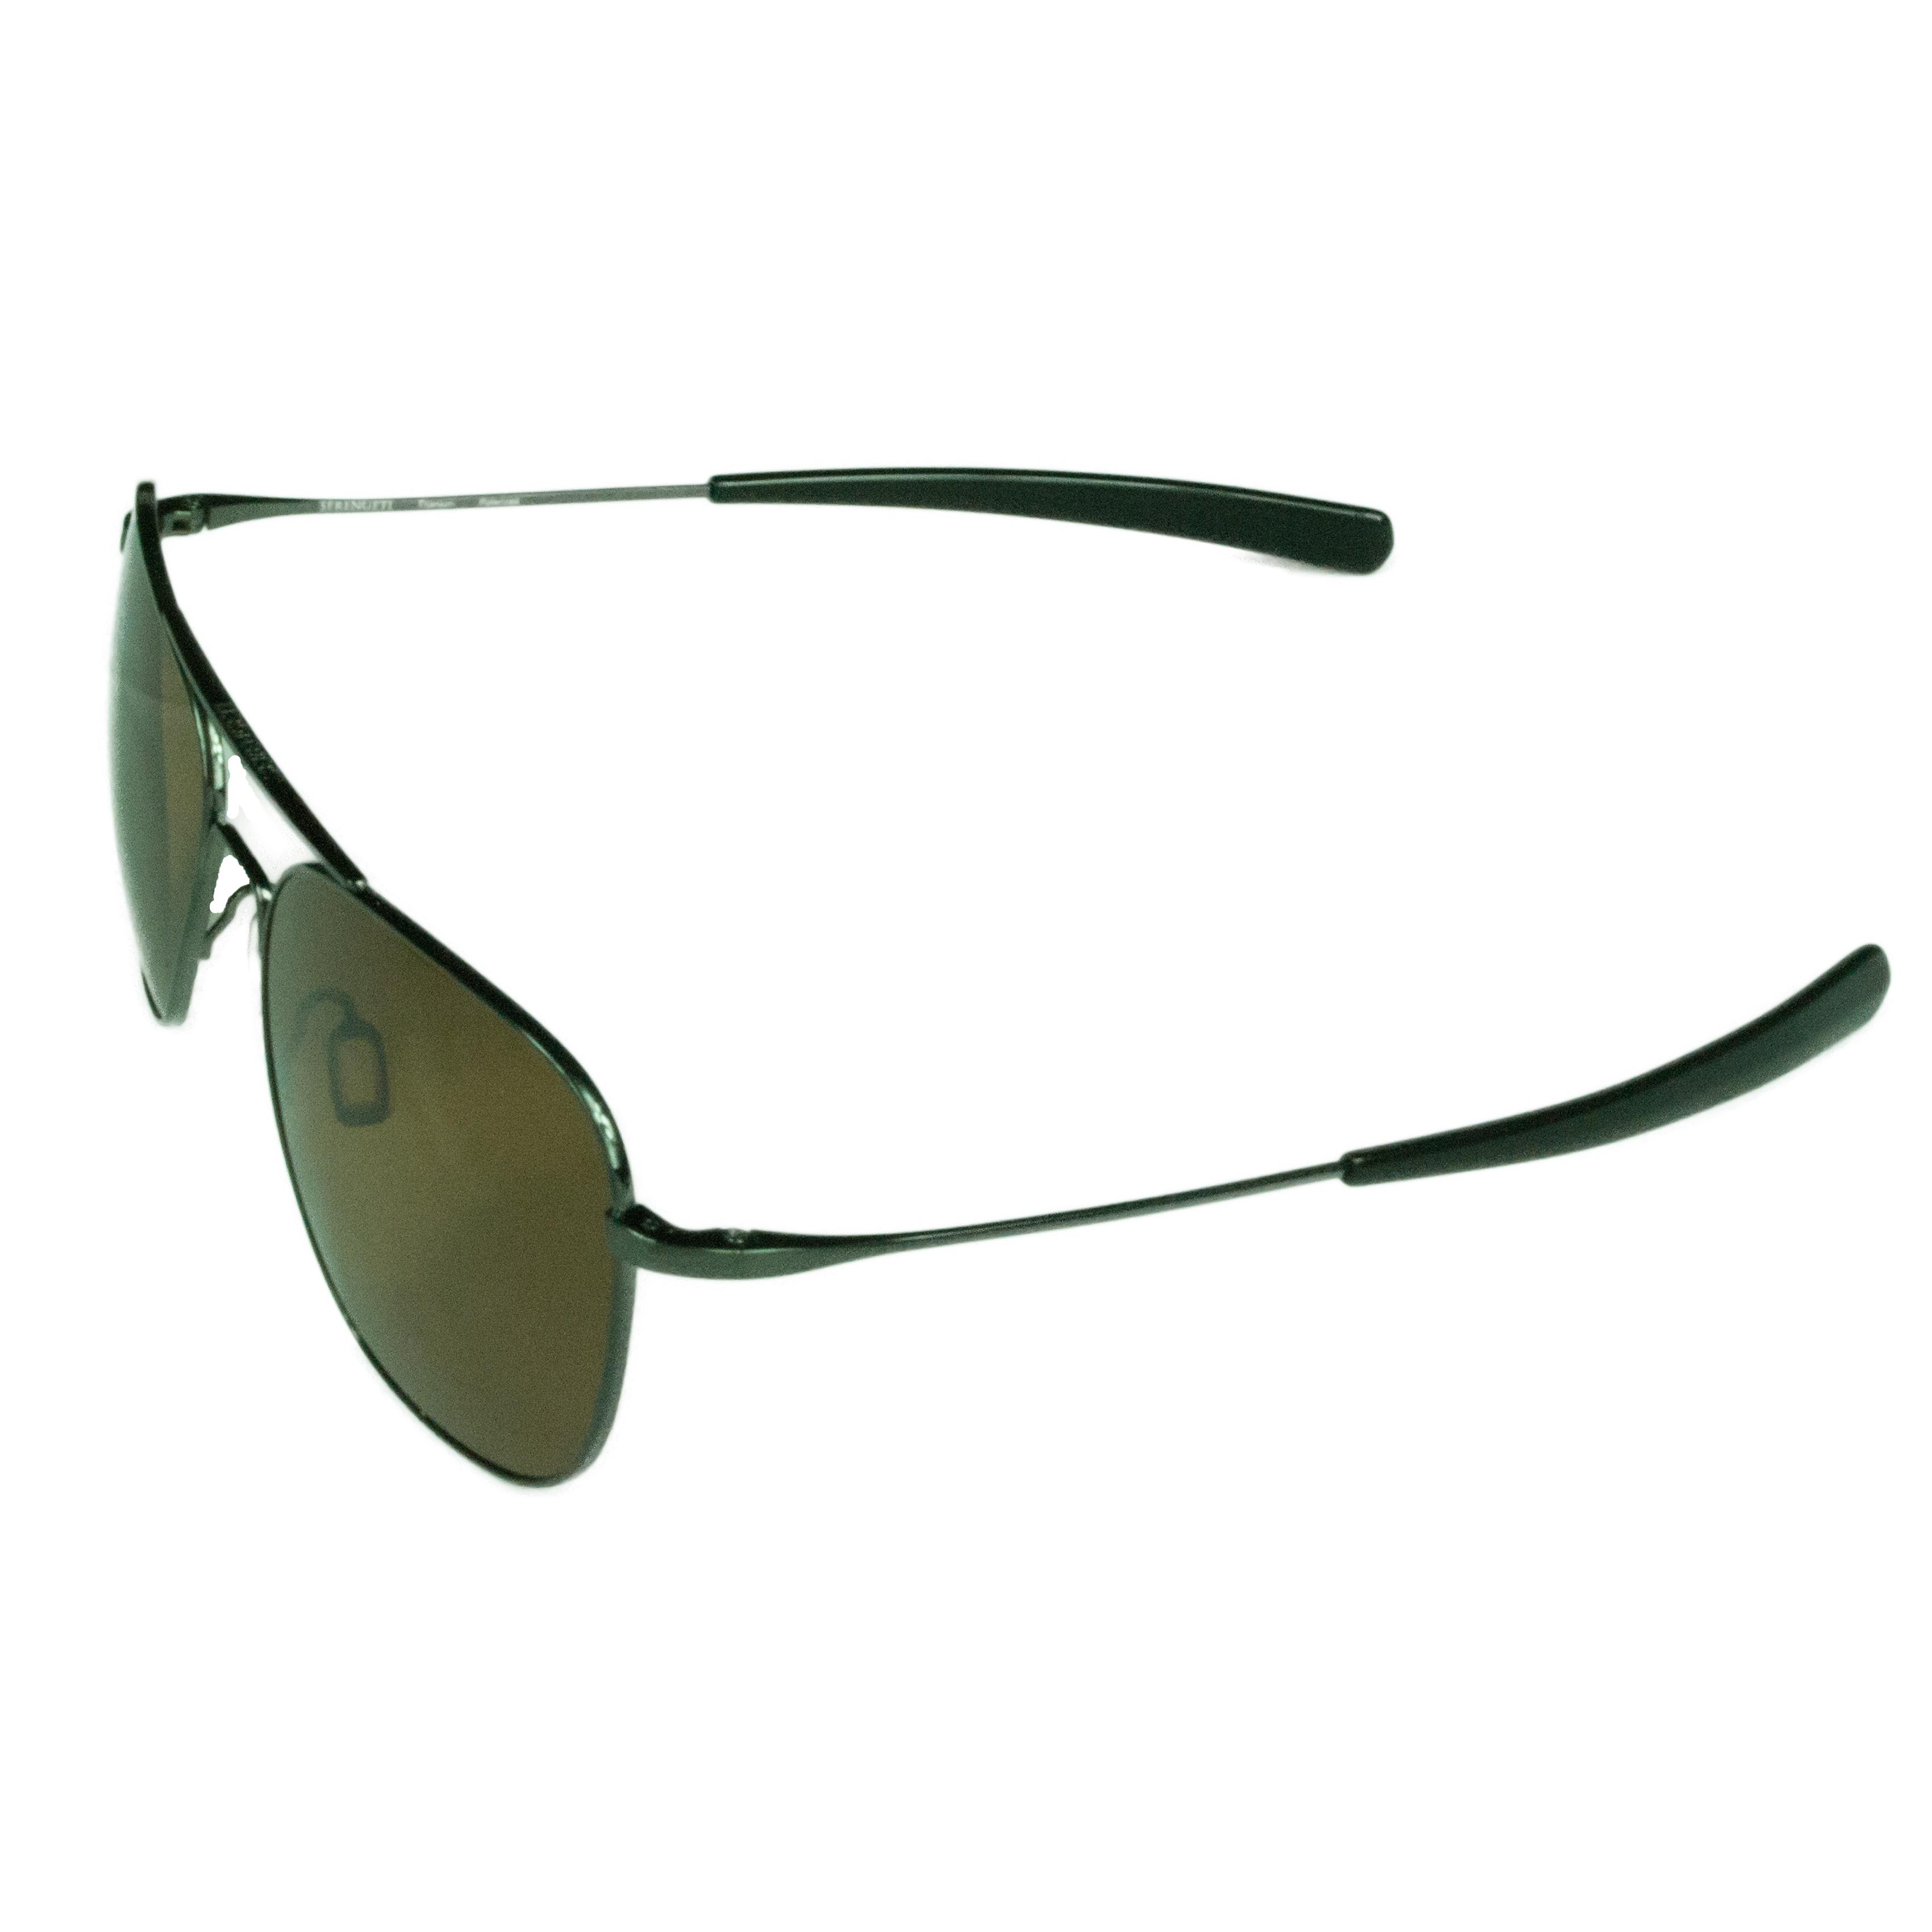 154e4c19483 Serengeti Fashion Unisex Aerial 7979 Shiny Hematite w  Polarized Driver  Lens Sunglasses